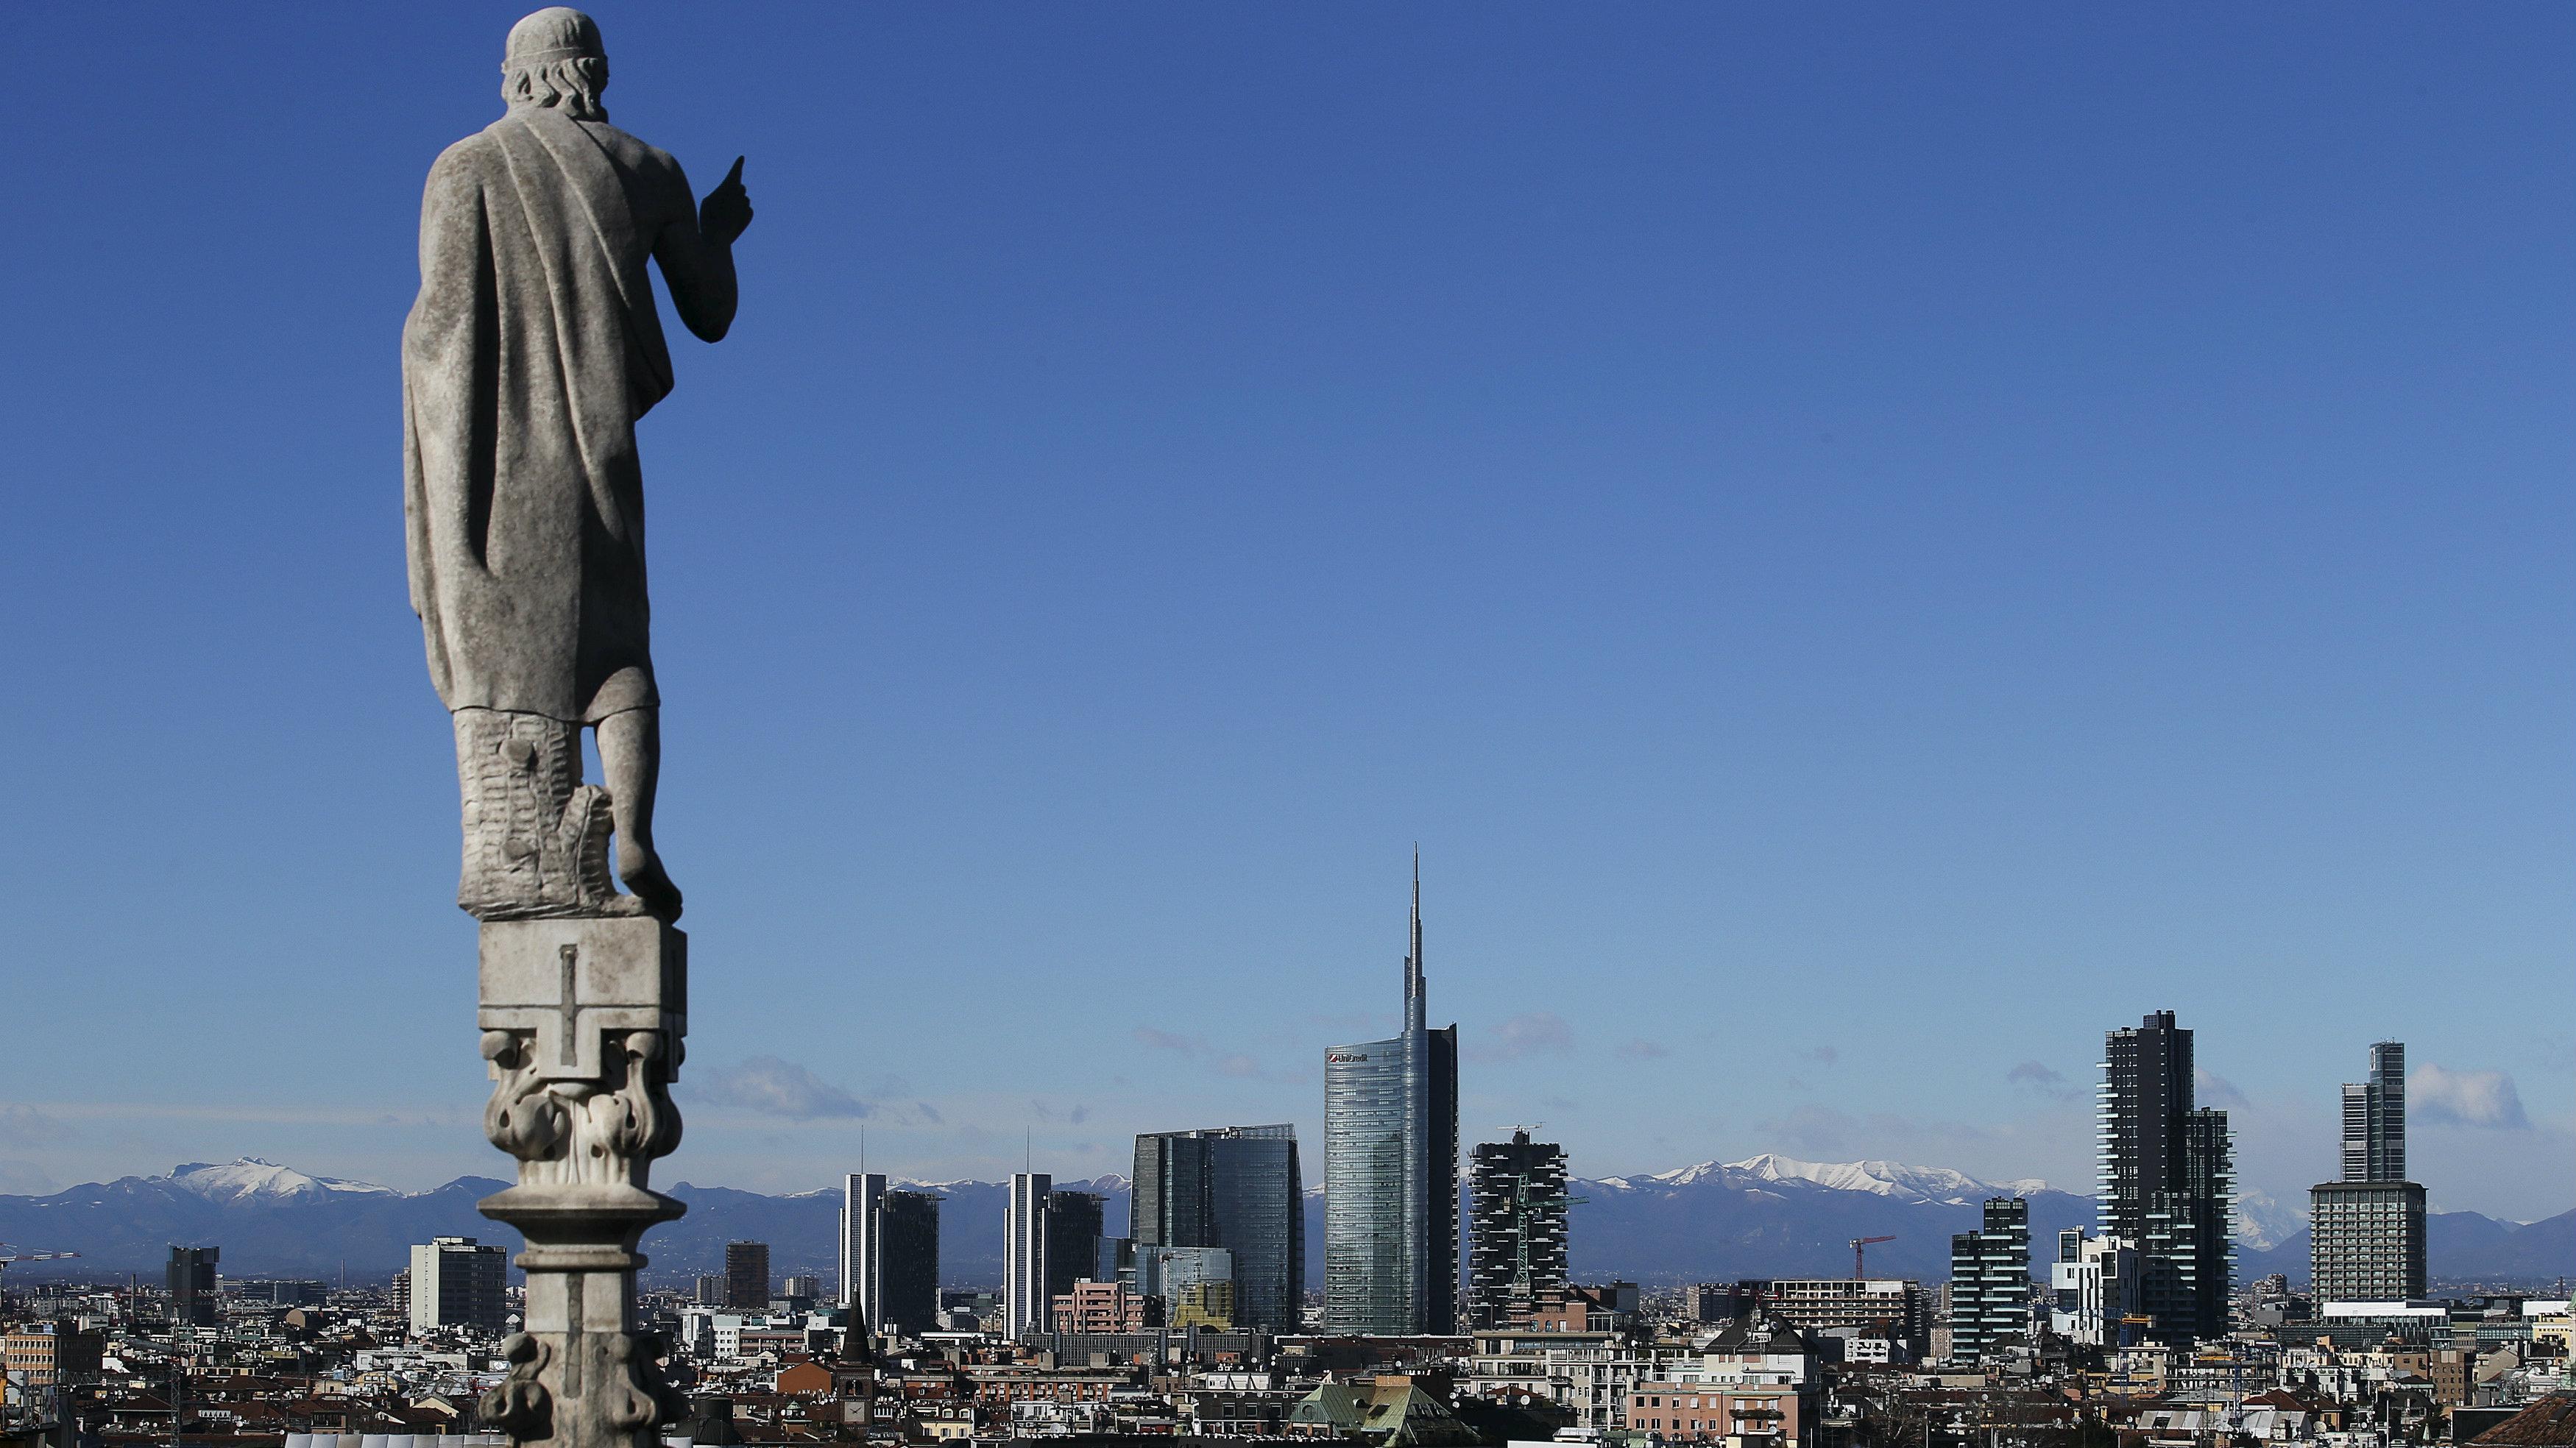 Skyline of Porta Nuova, Milan's business district